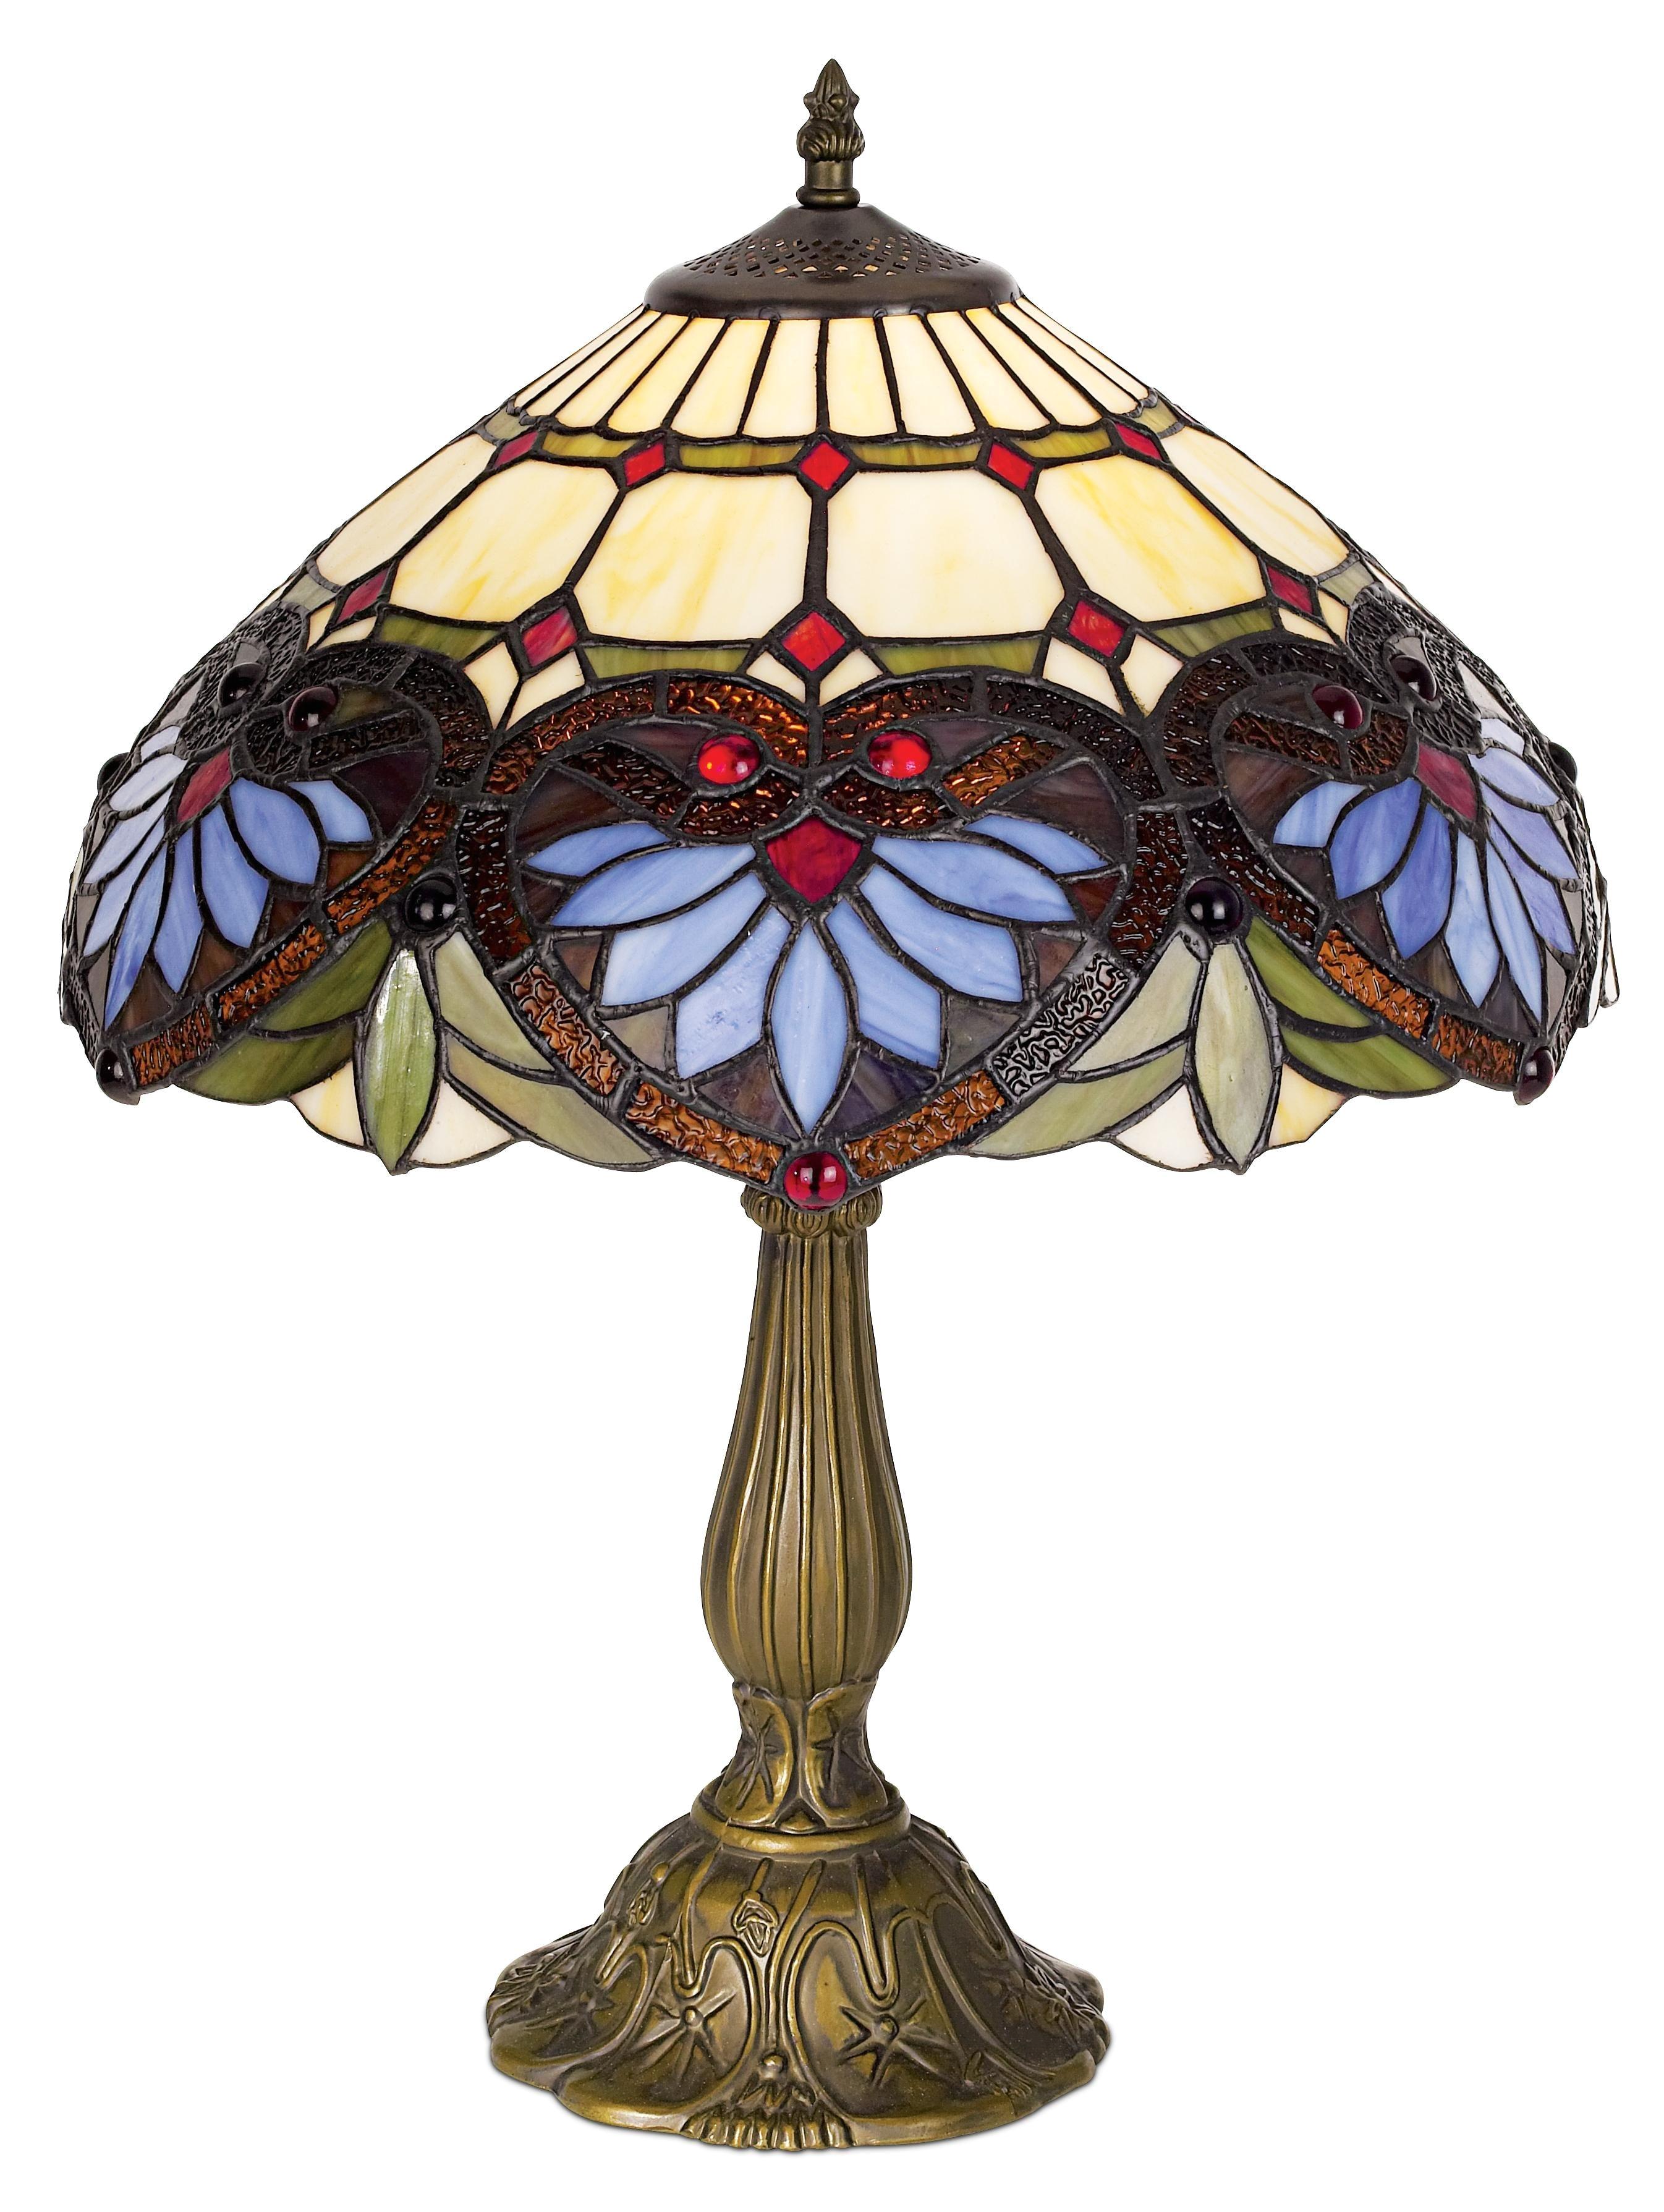 Antique Tiffany Lamp Parts Tiffany Style Heart Pattern 22 High Table Lamp Tiffany Style